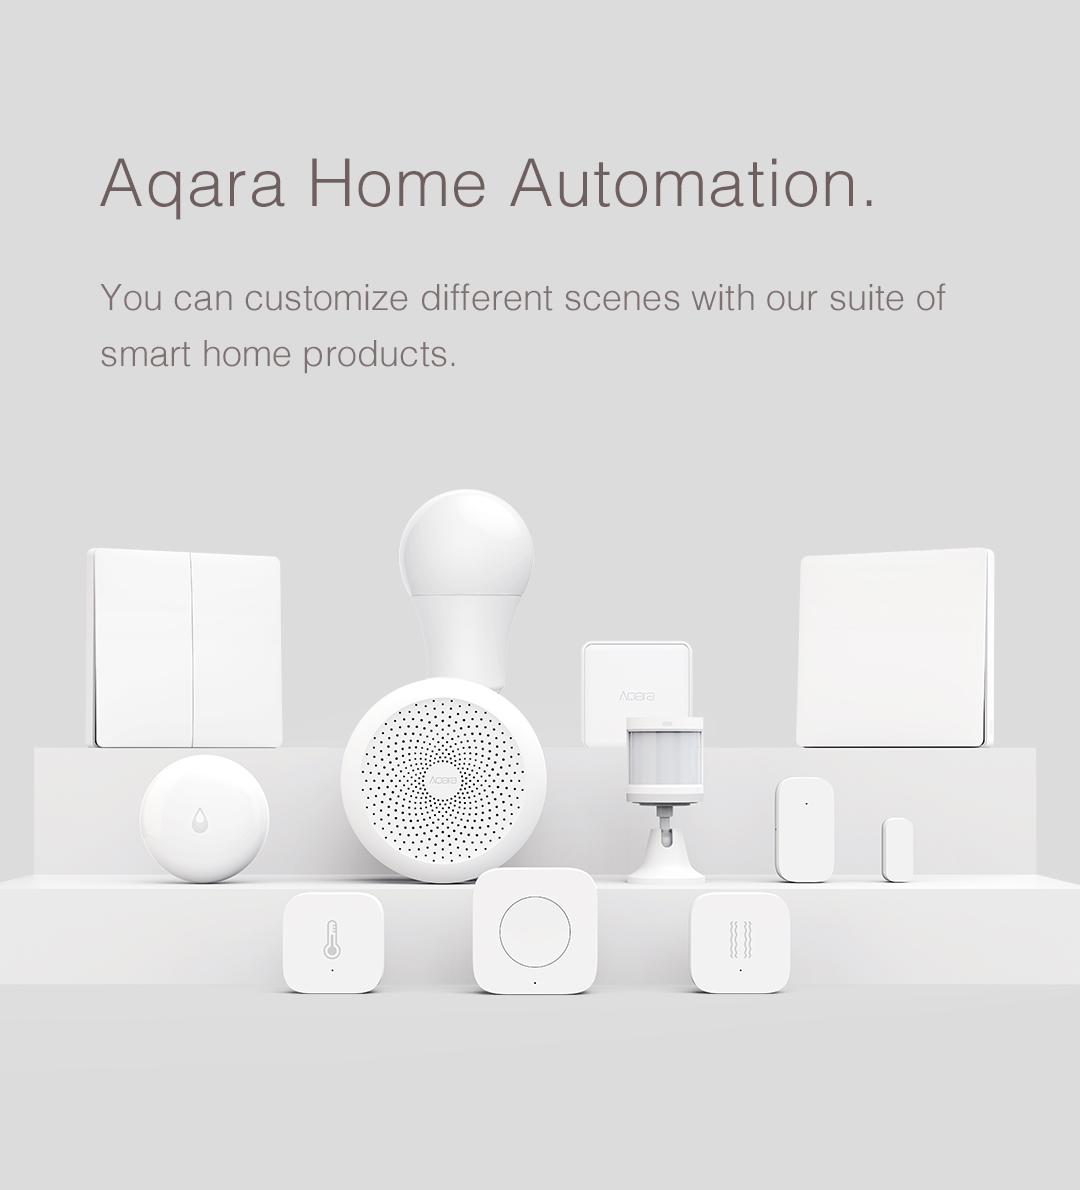 Aqara home automation products